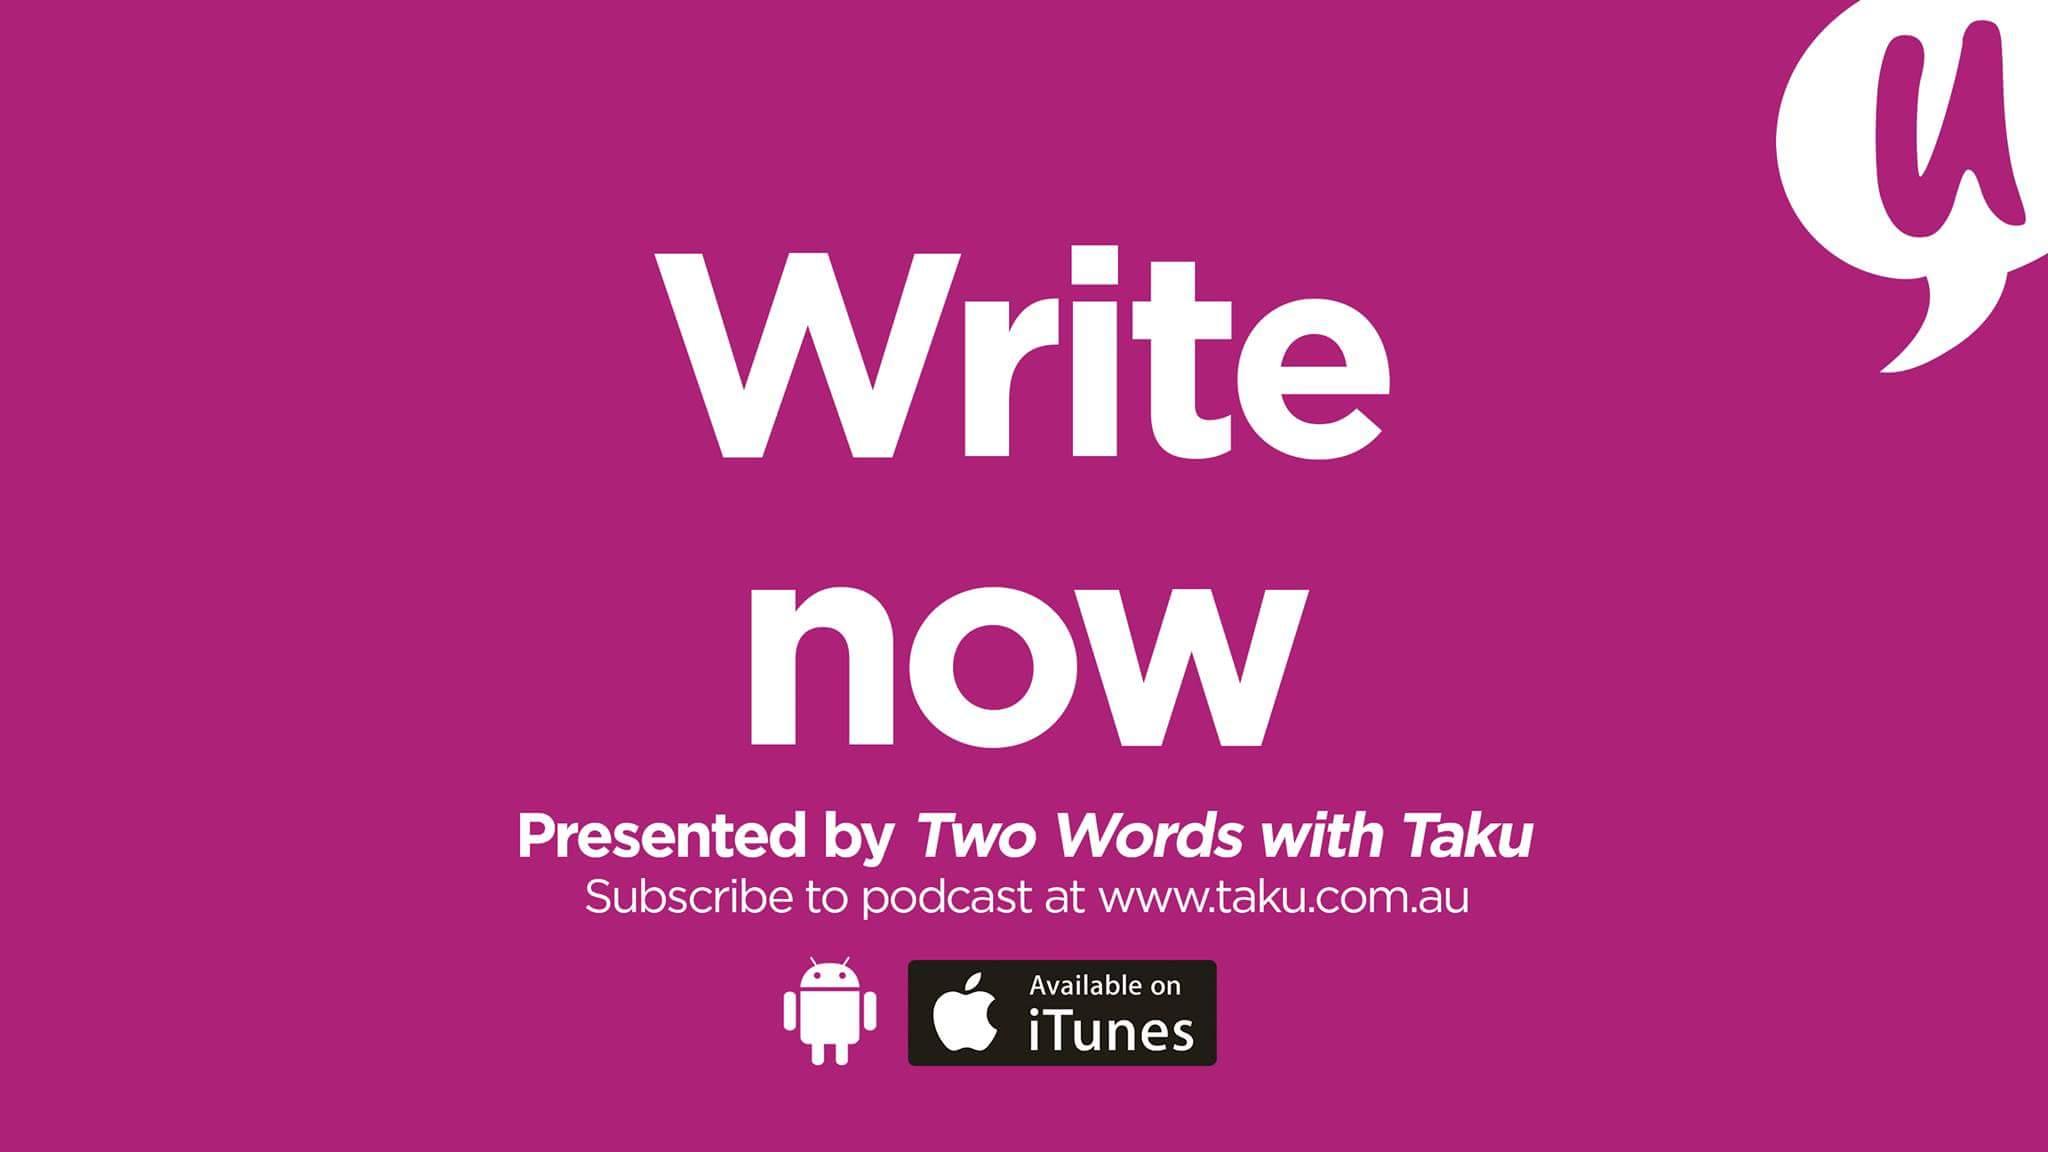 Write now writing podcast Taku Mbudzi